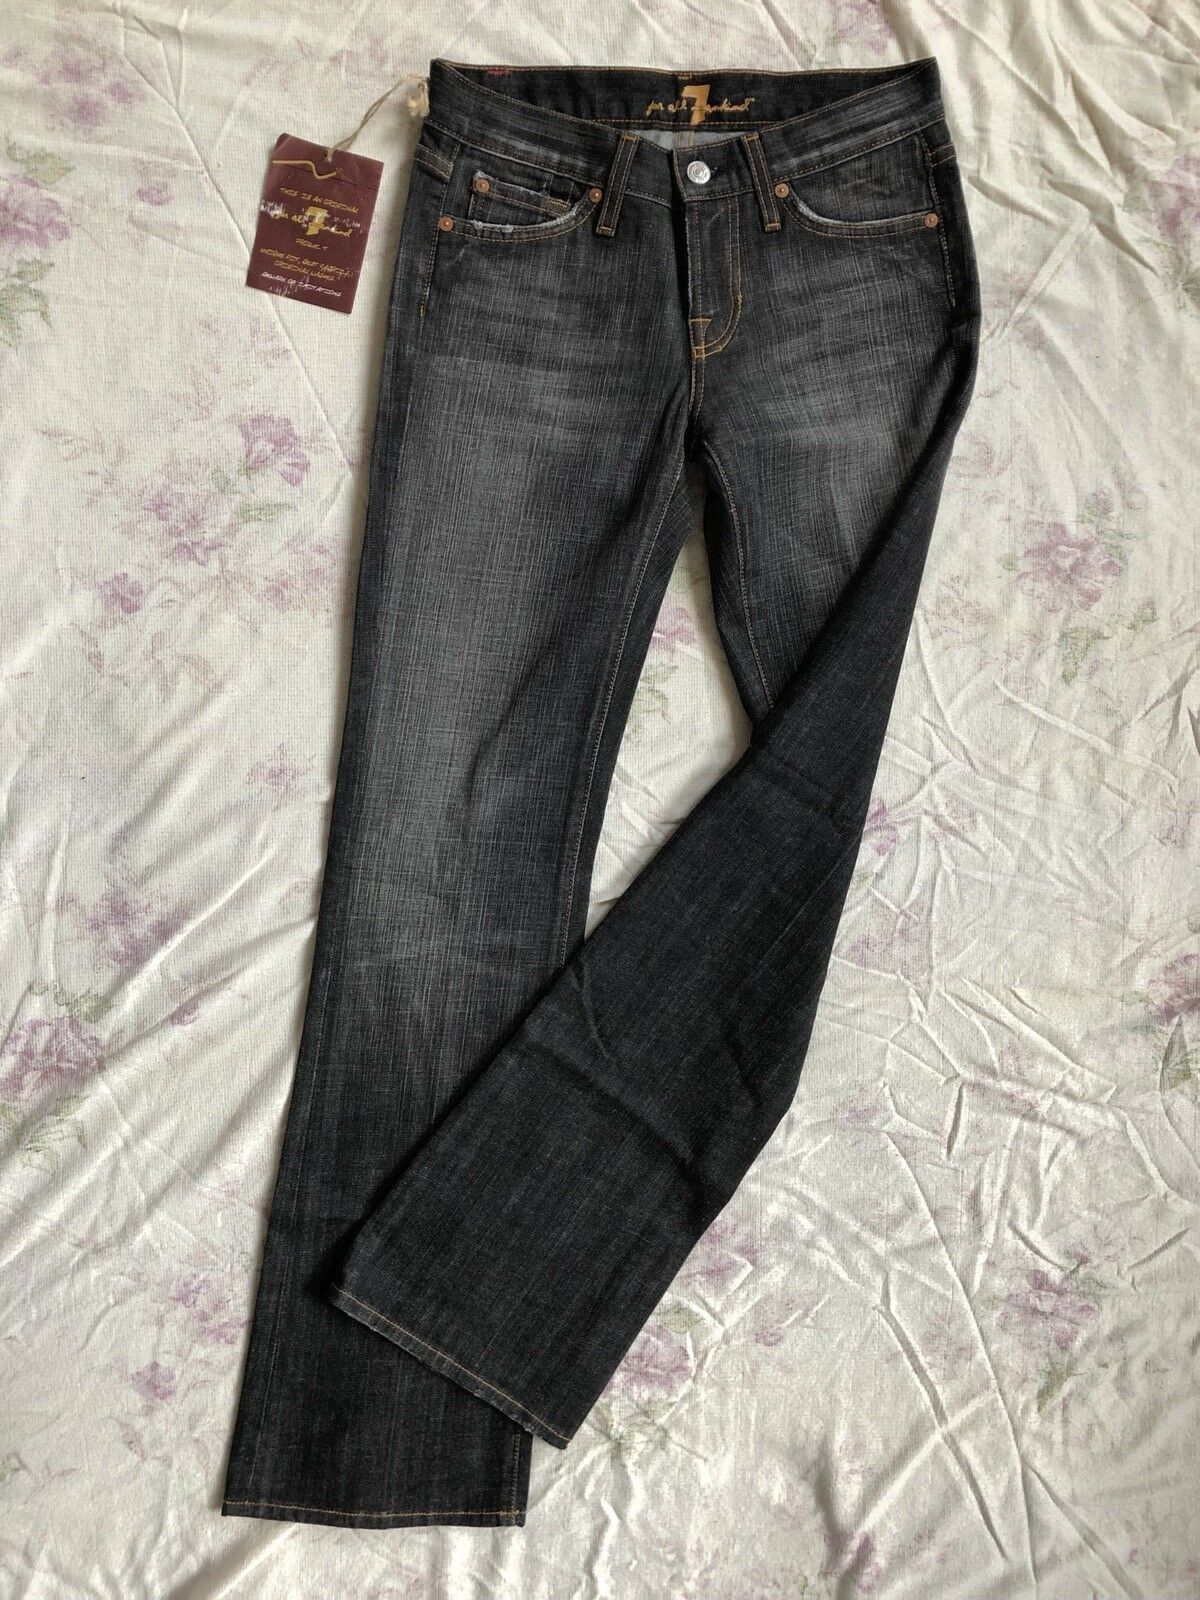 7 SEVEN for all MANKIND Jeans Stretch W26 L32 low waist slim fit Stiefelcut leg